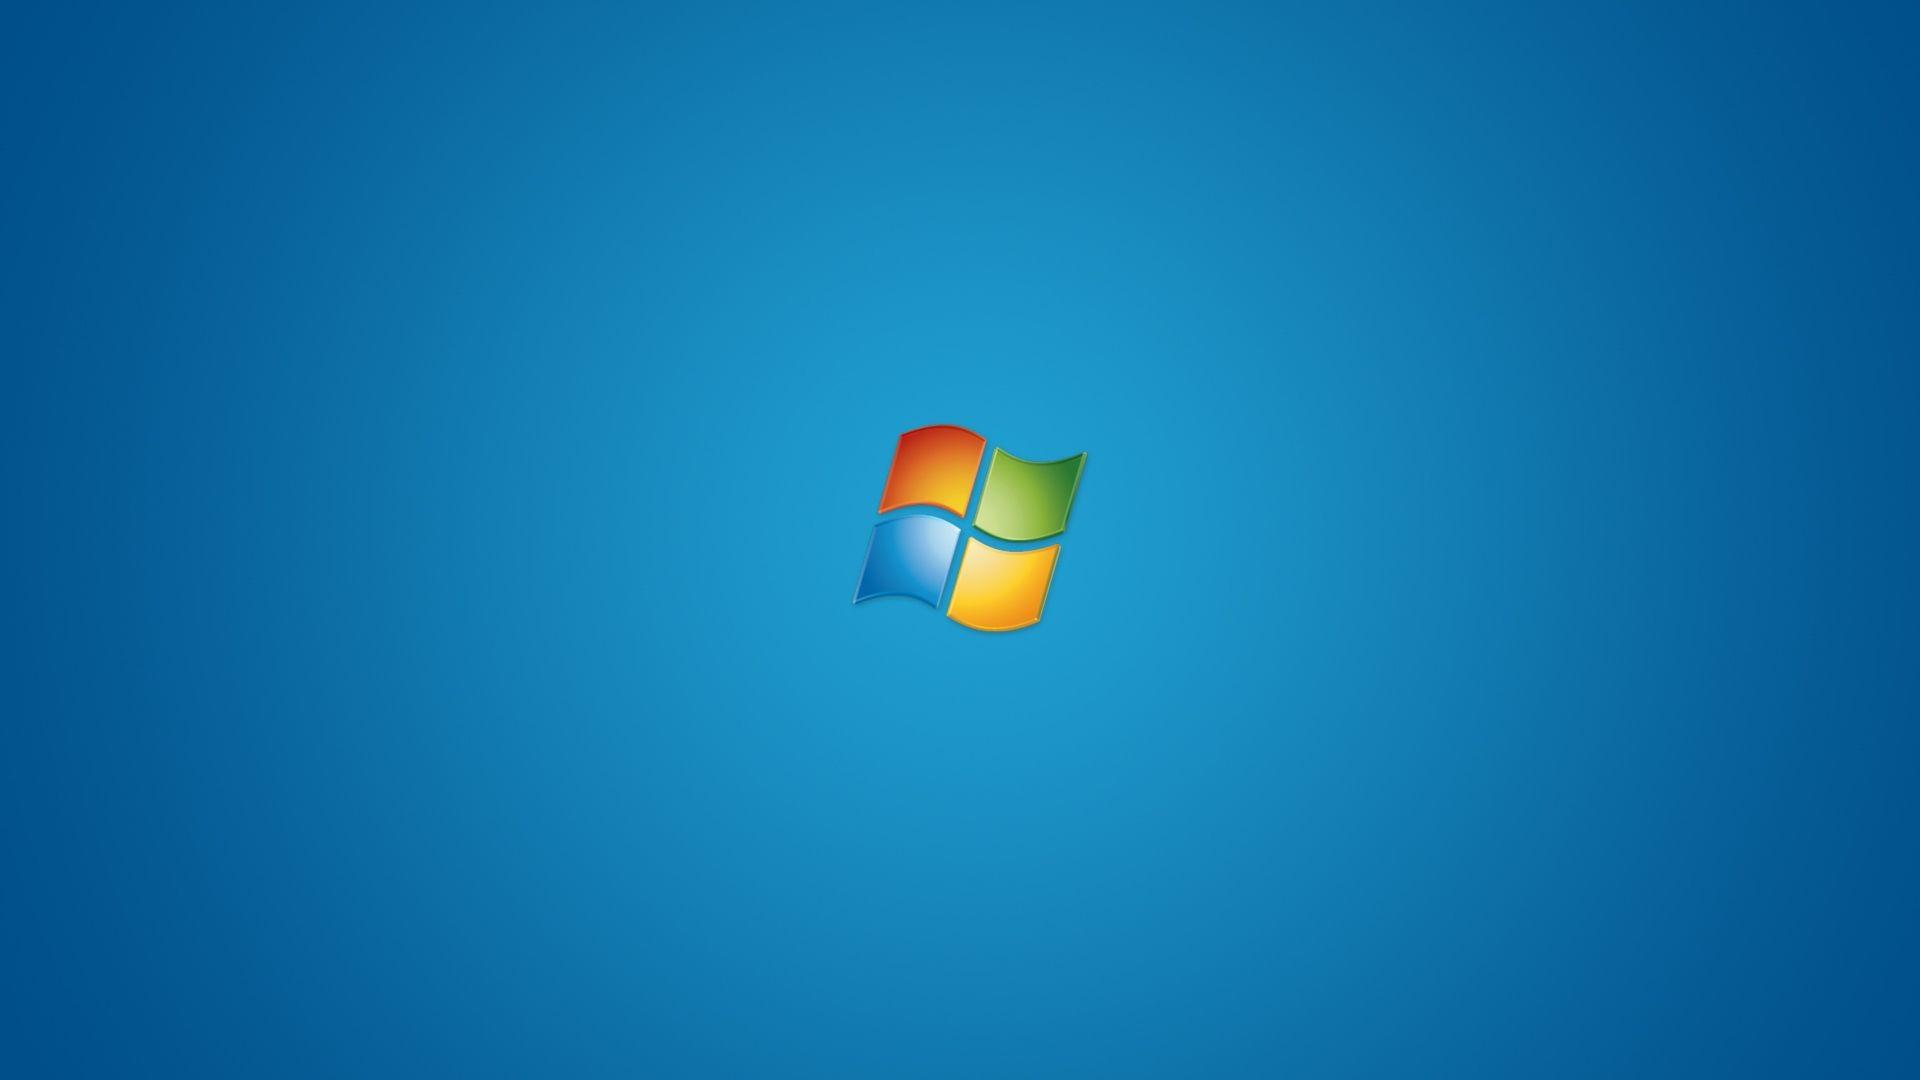 Desktop Backgrounds Hd 1080p